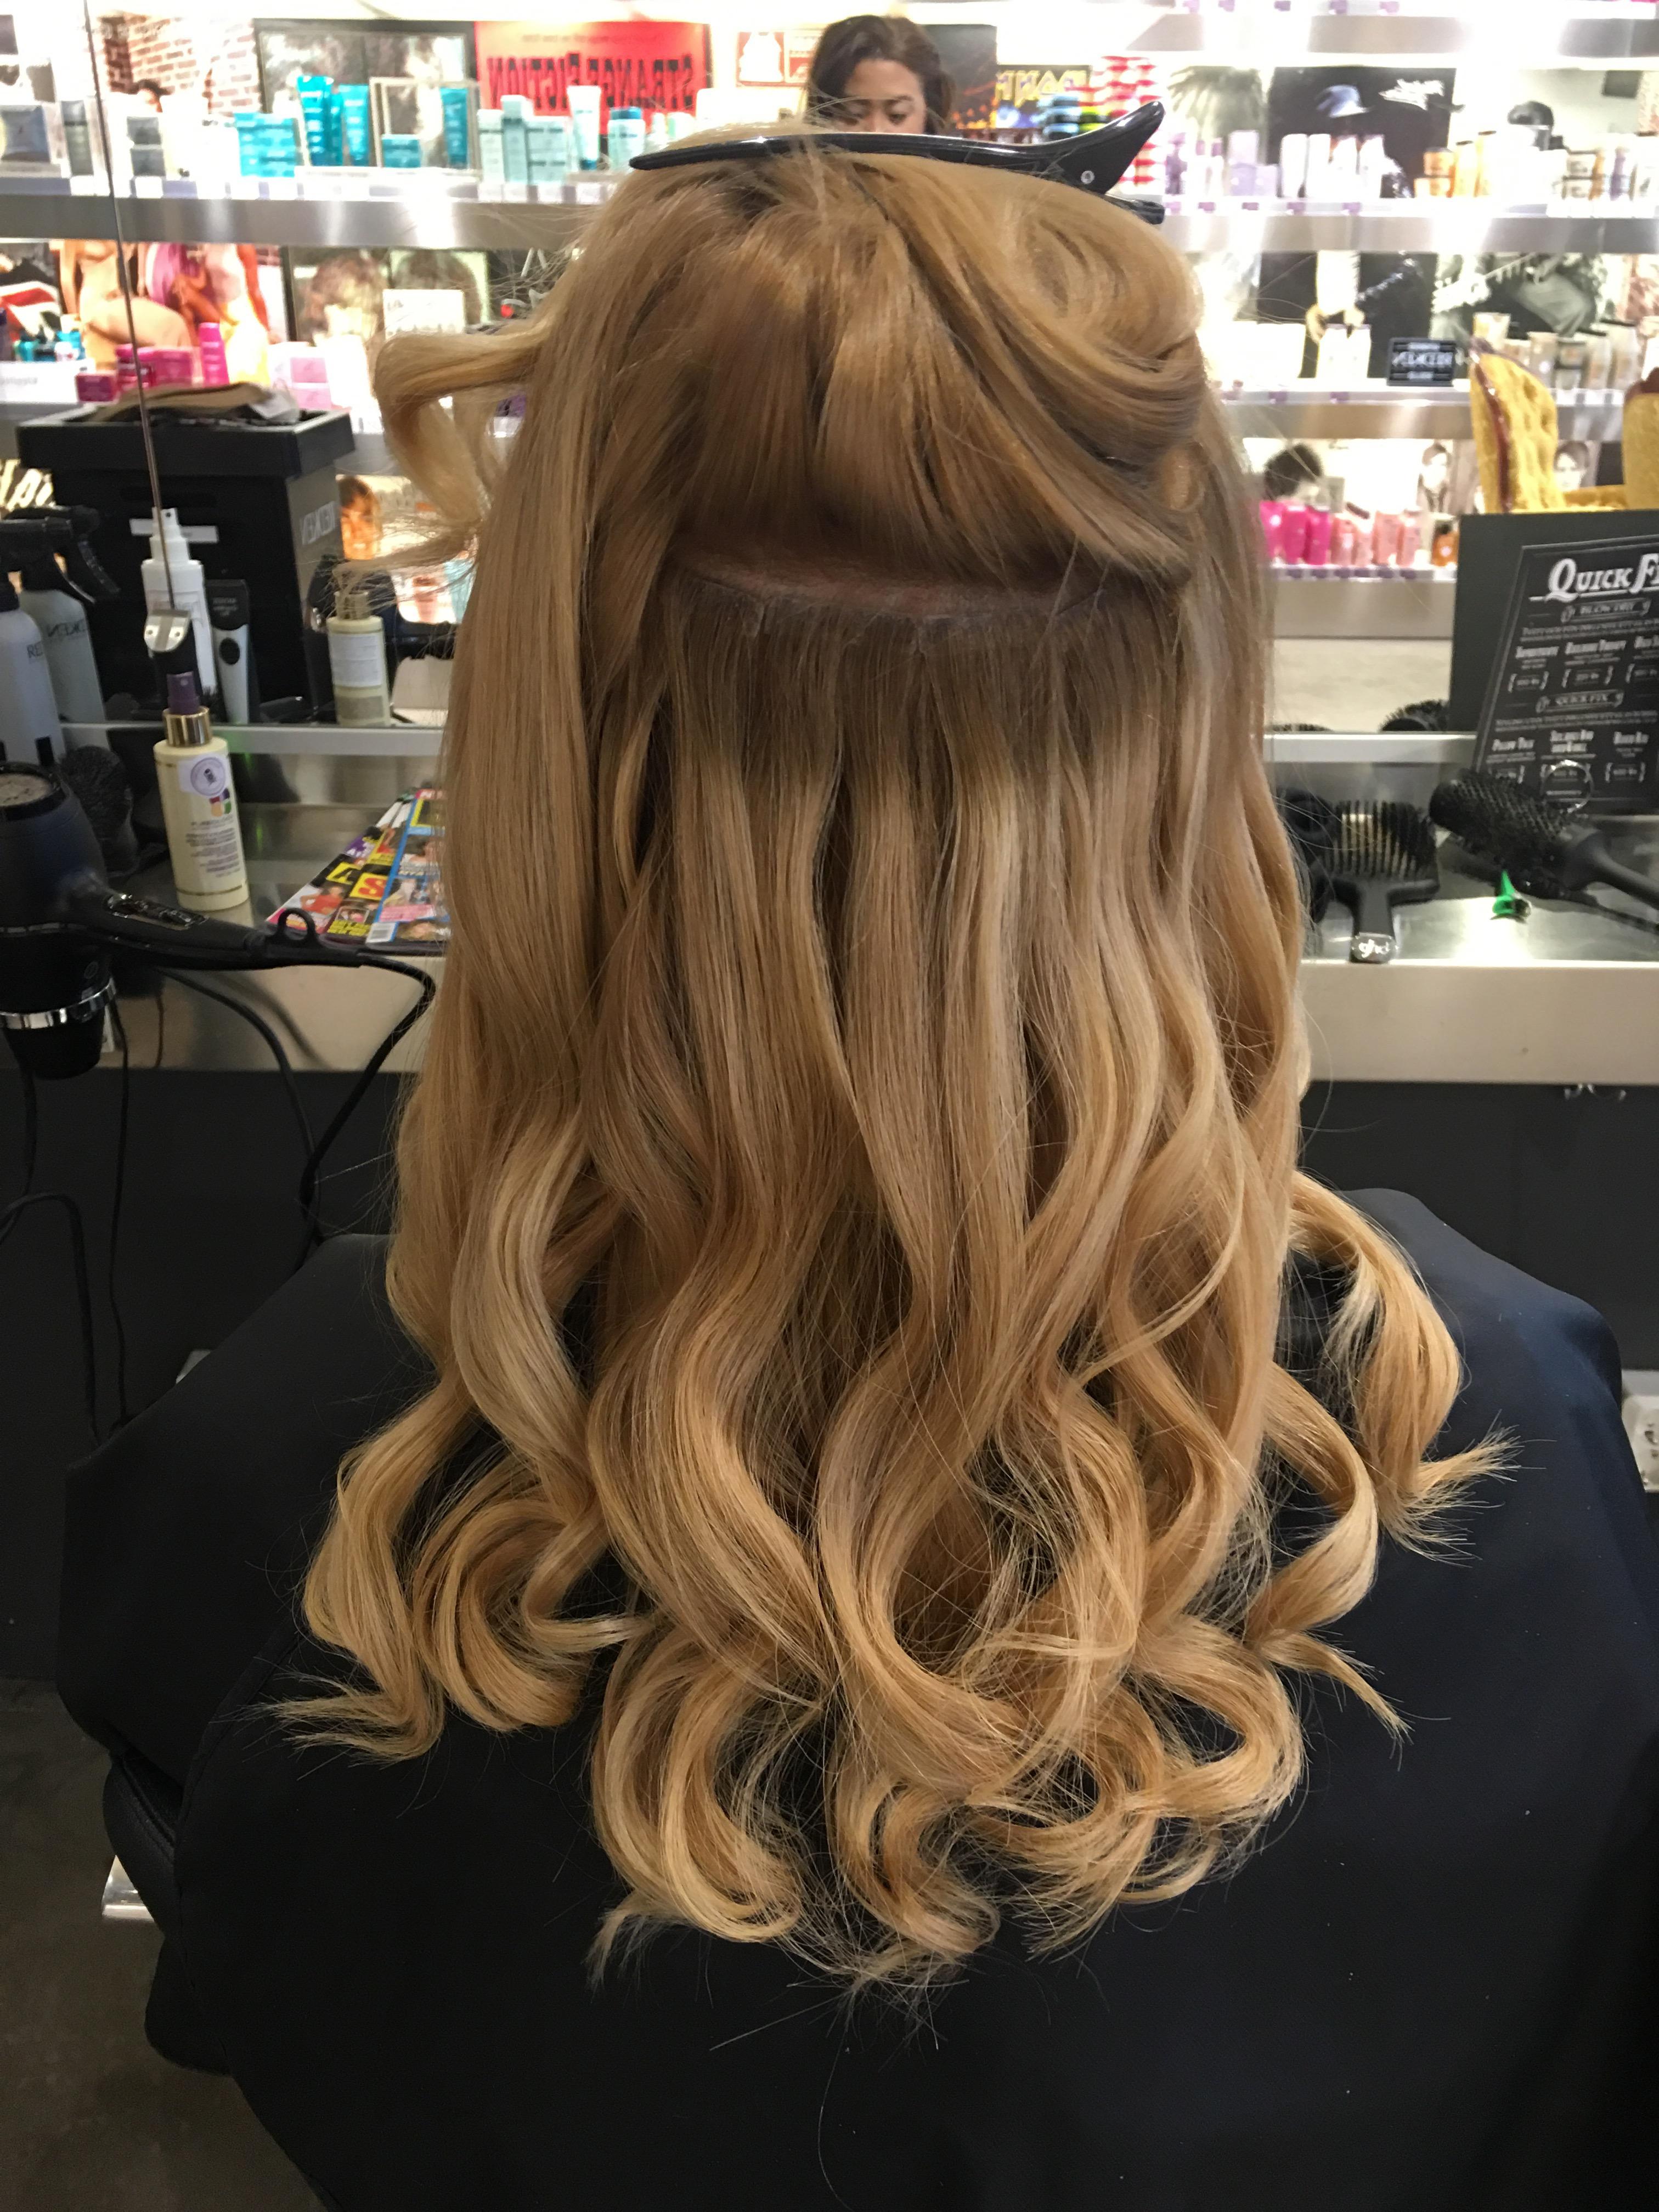 extensions sliter på håret